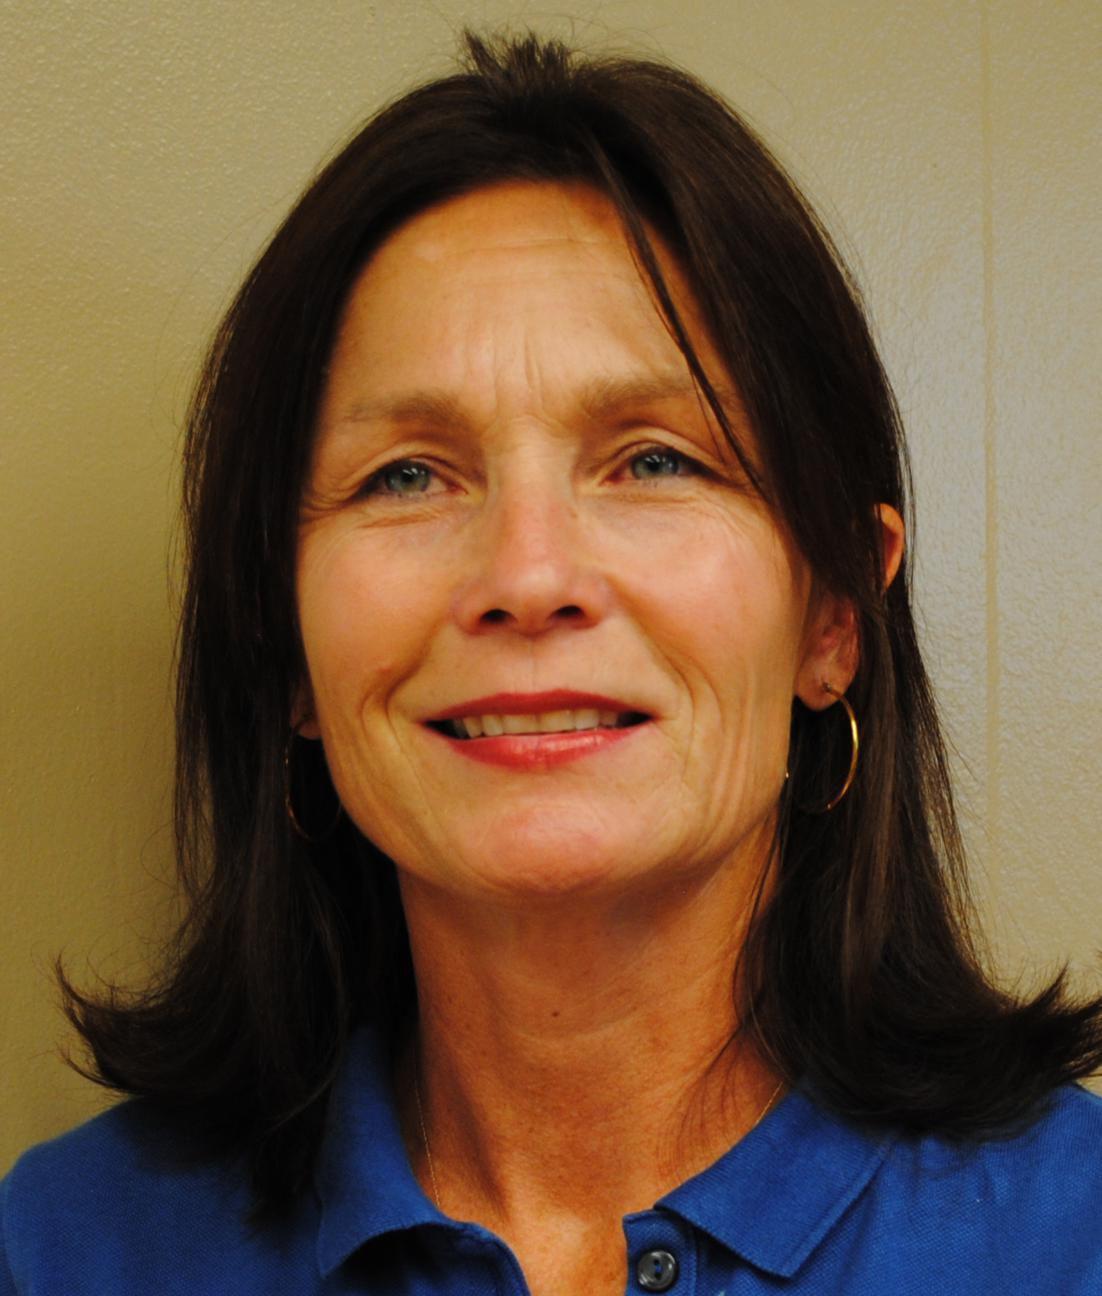 Shelton announces for alderman post